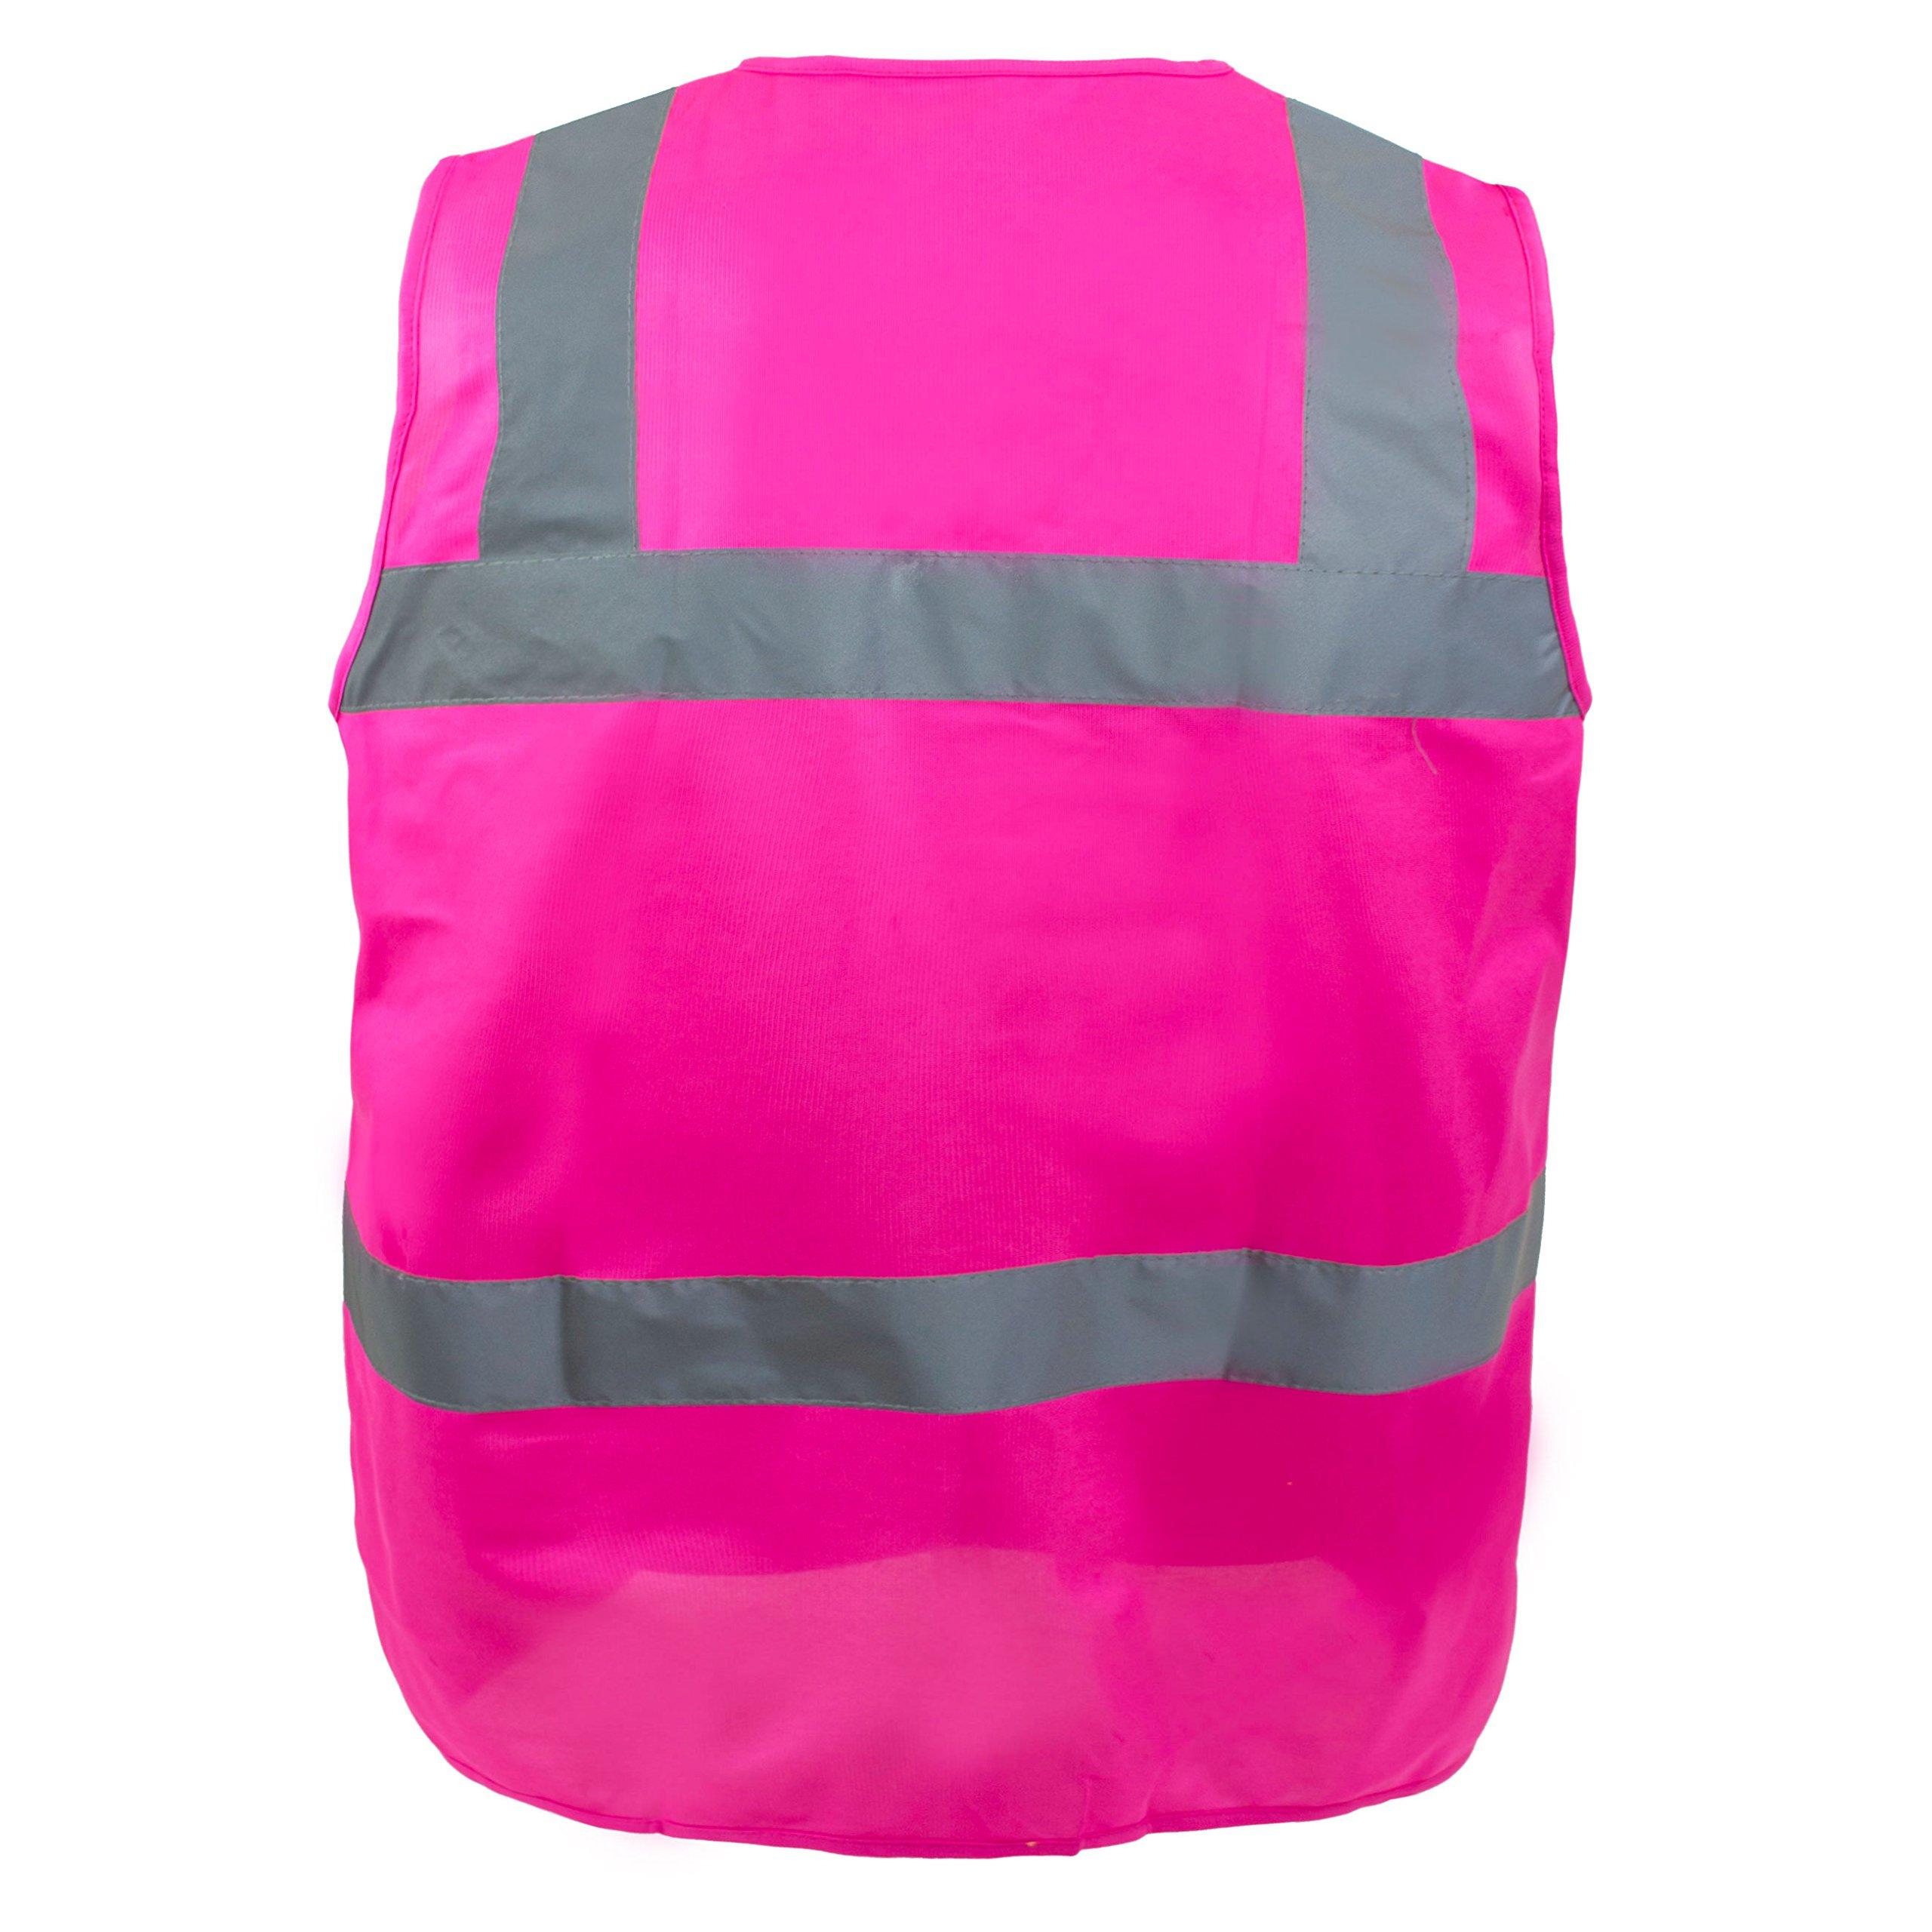 RK Safety PK0430 ANSI/ISEA Class 2 Certified Female Safety Vest (Pink, Medium) by New York Hi-Viz Workwear (Image #2)